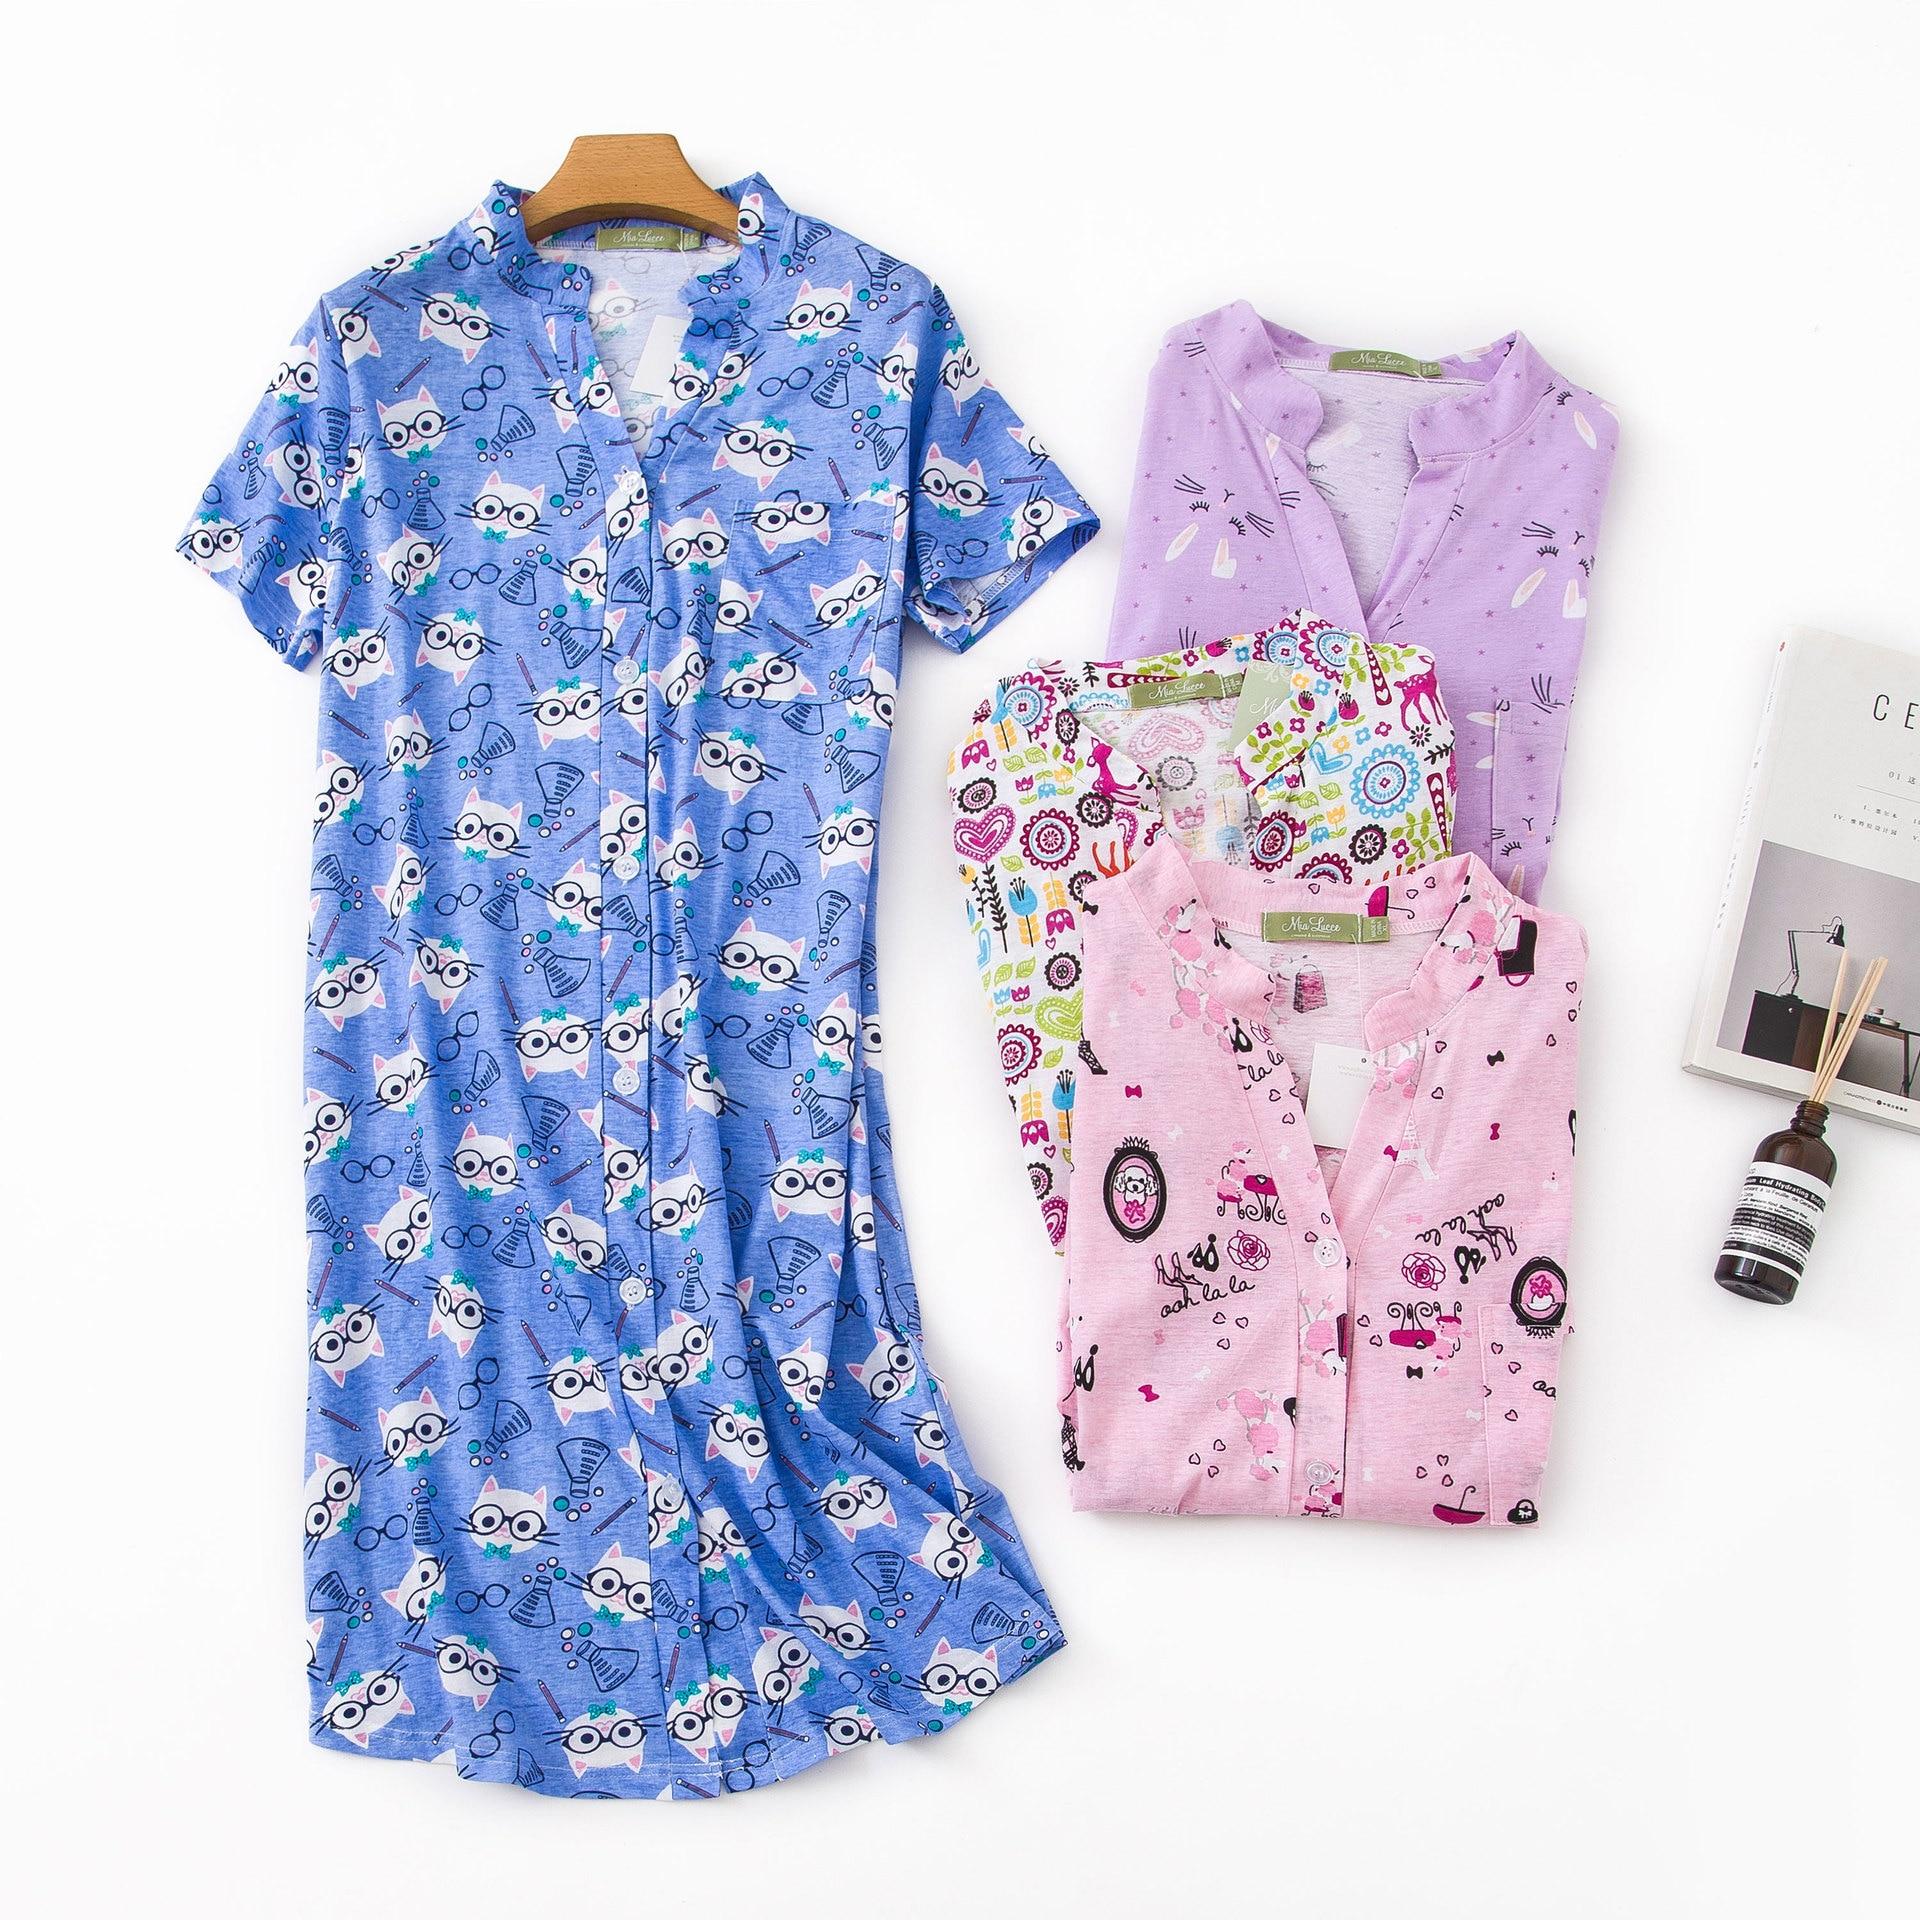 New 100% Cotton Short-sleeved Nightdress Cartoon Night Wear Ropa Para Dormir Mujer Womens   Nightgown   Sleepwear Sexy   Sleepshirts